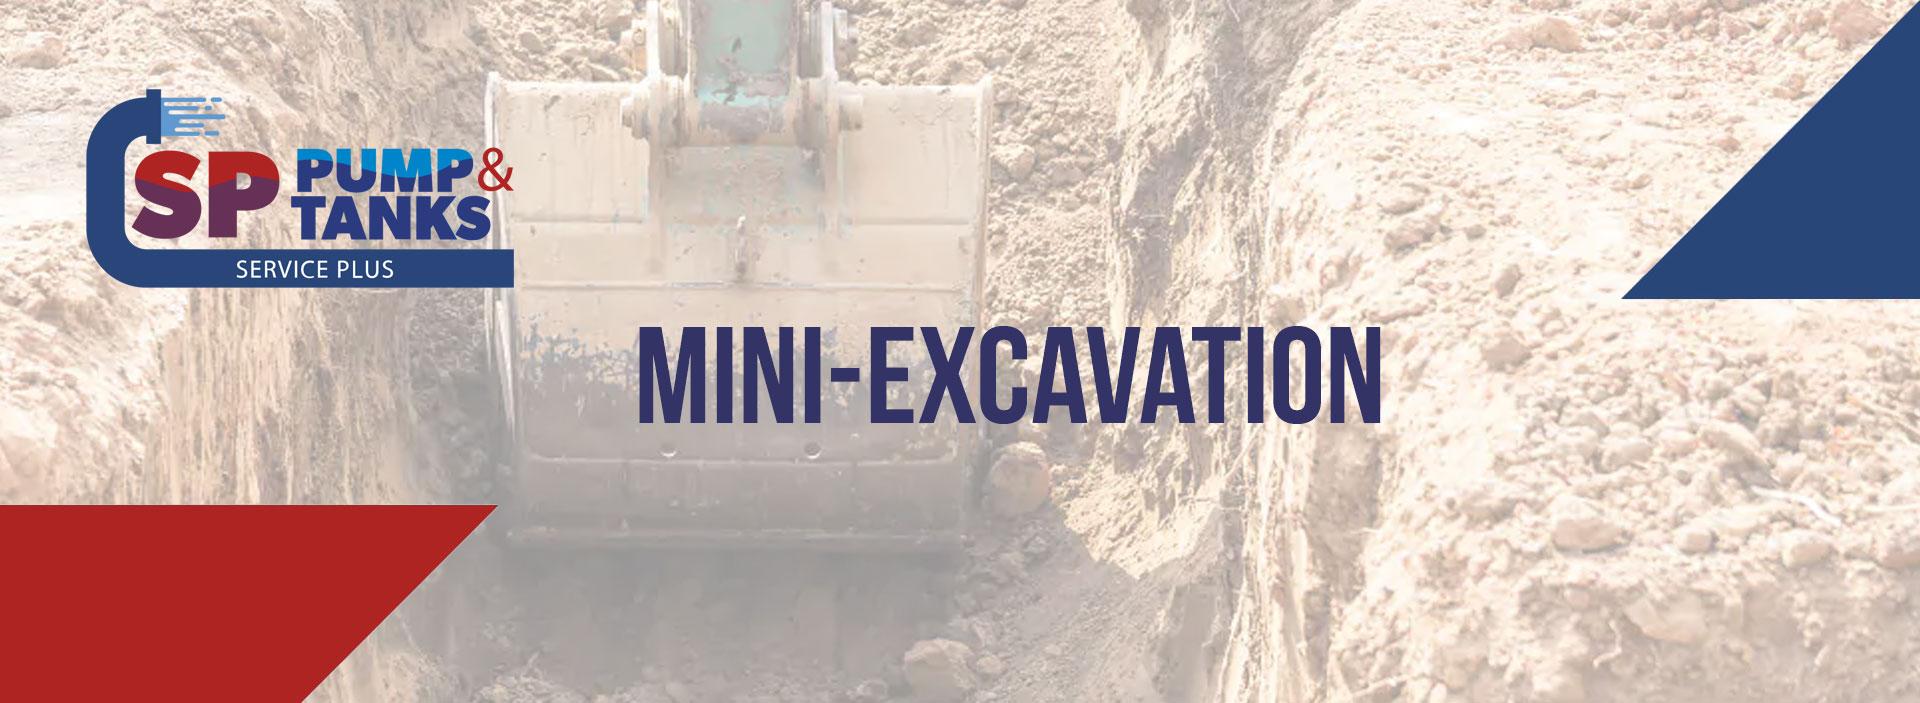 mini-excavation service